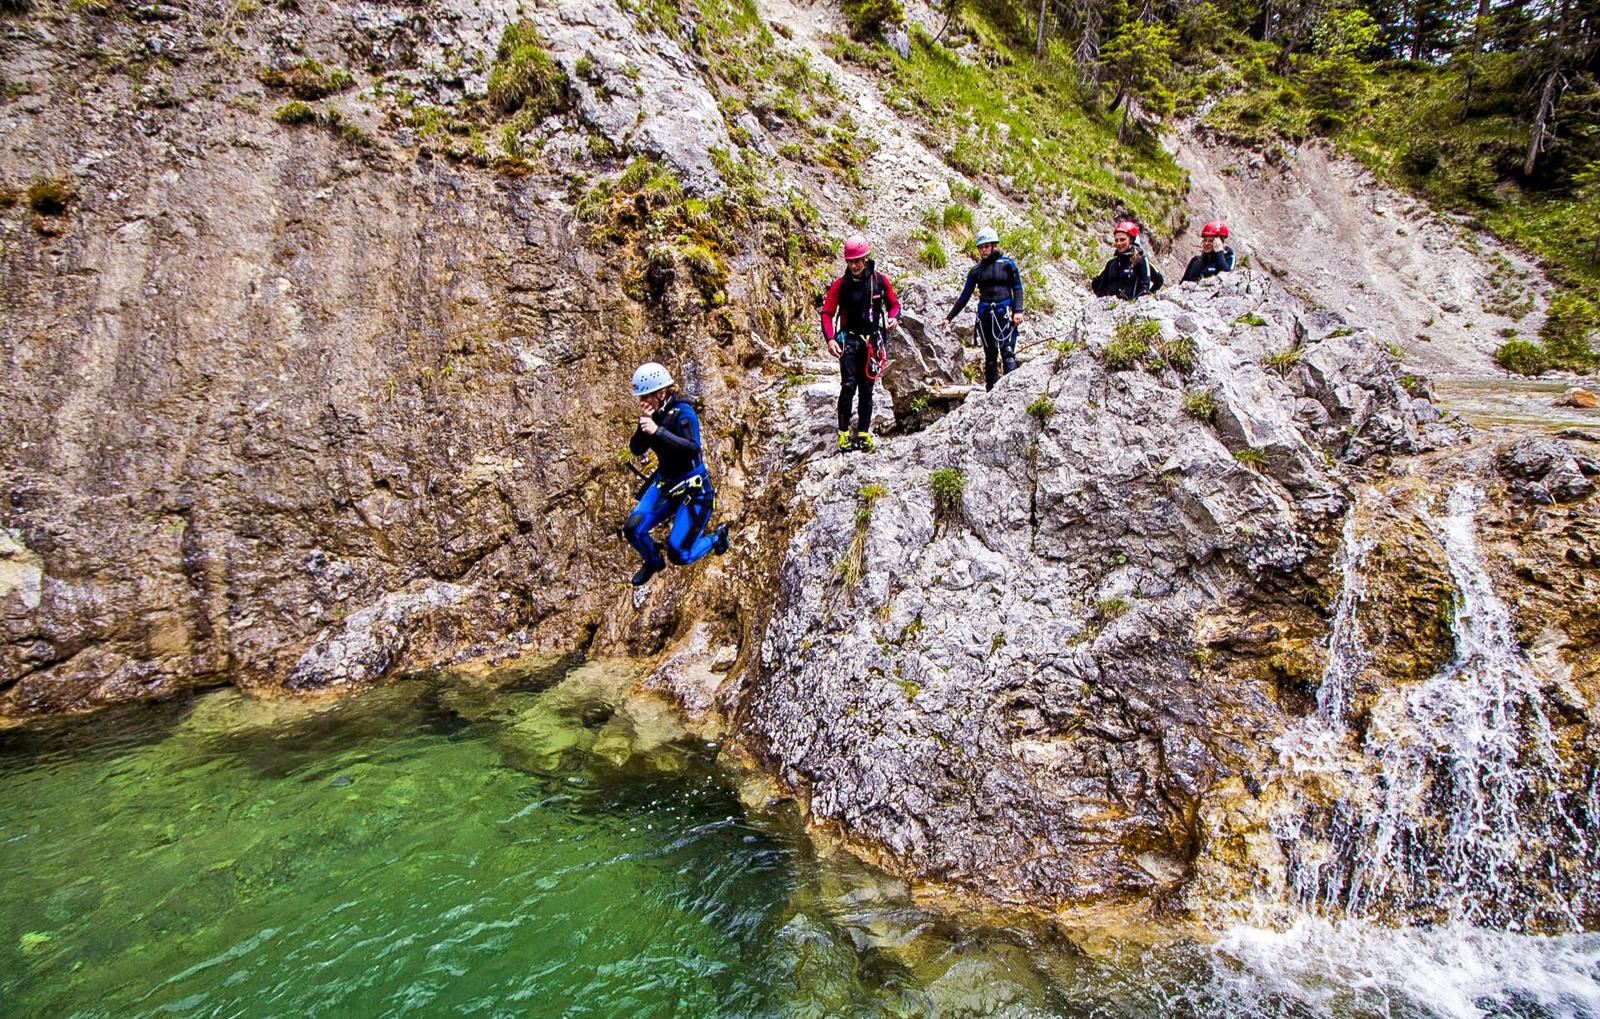 canyoning-tour-reutte-bg1